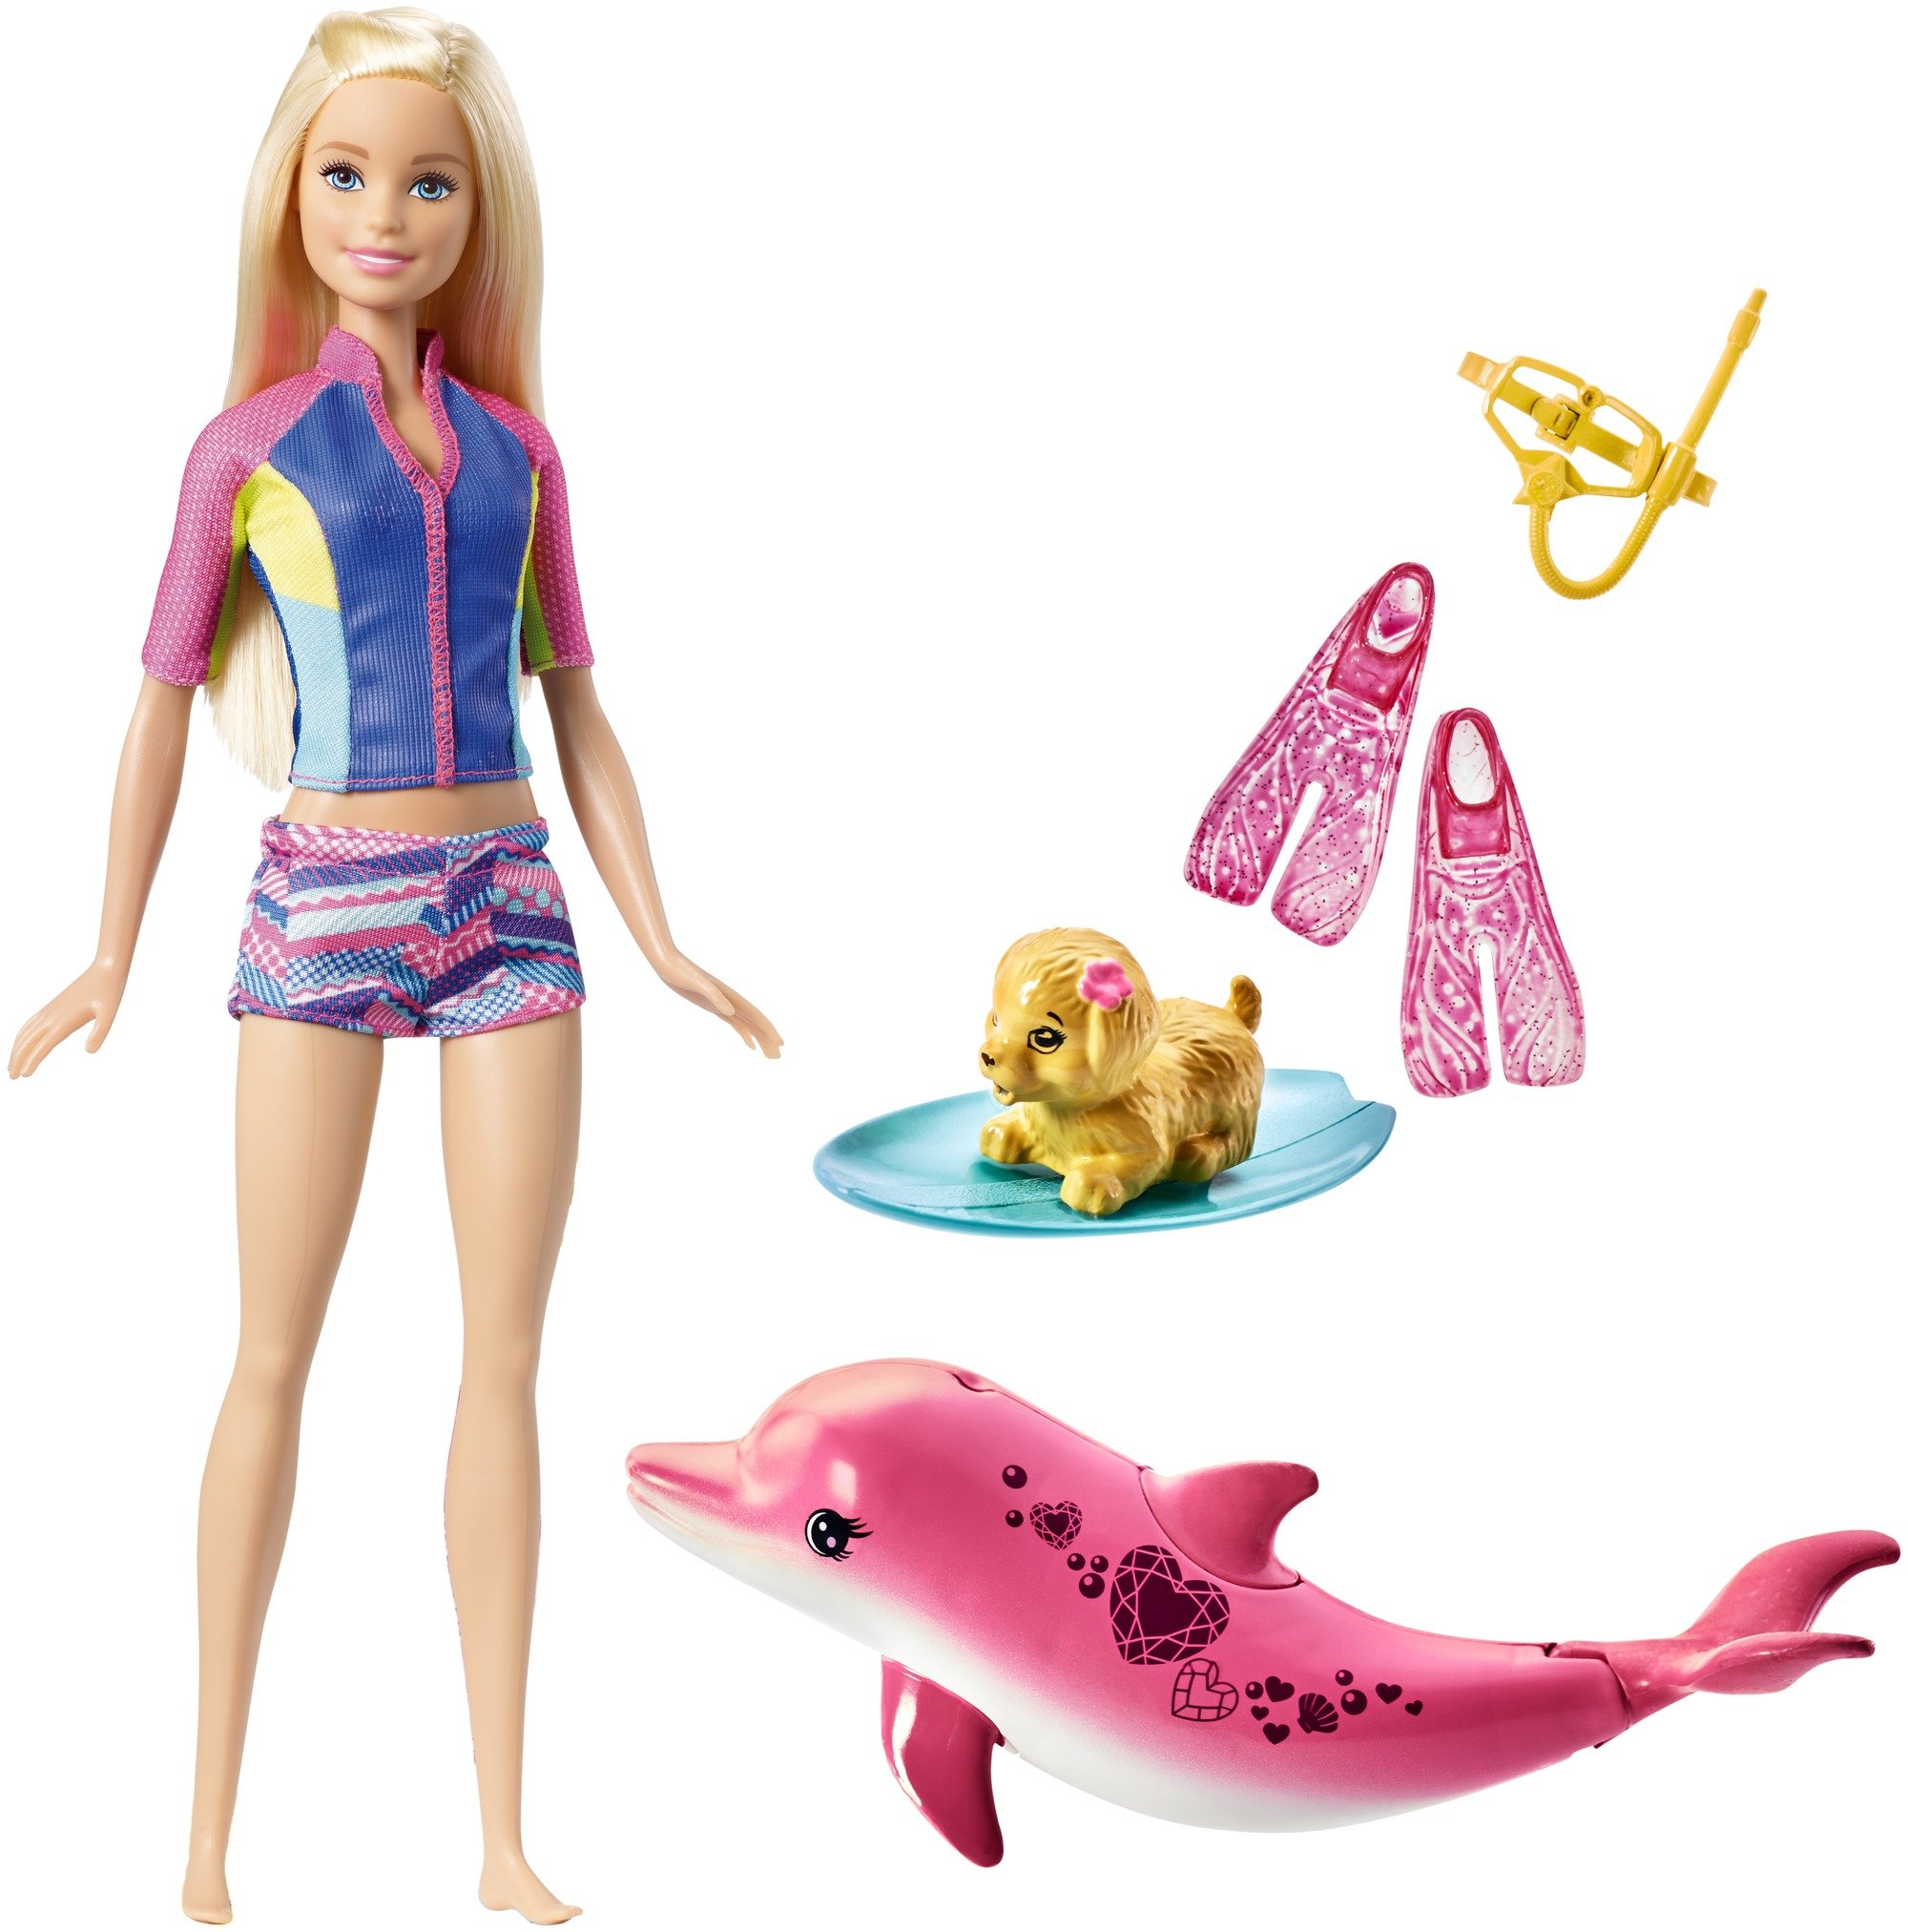 Barbie Dolphin Magic Snorkel Fun Friends Playset